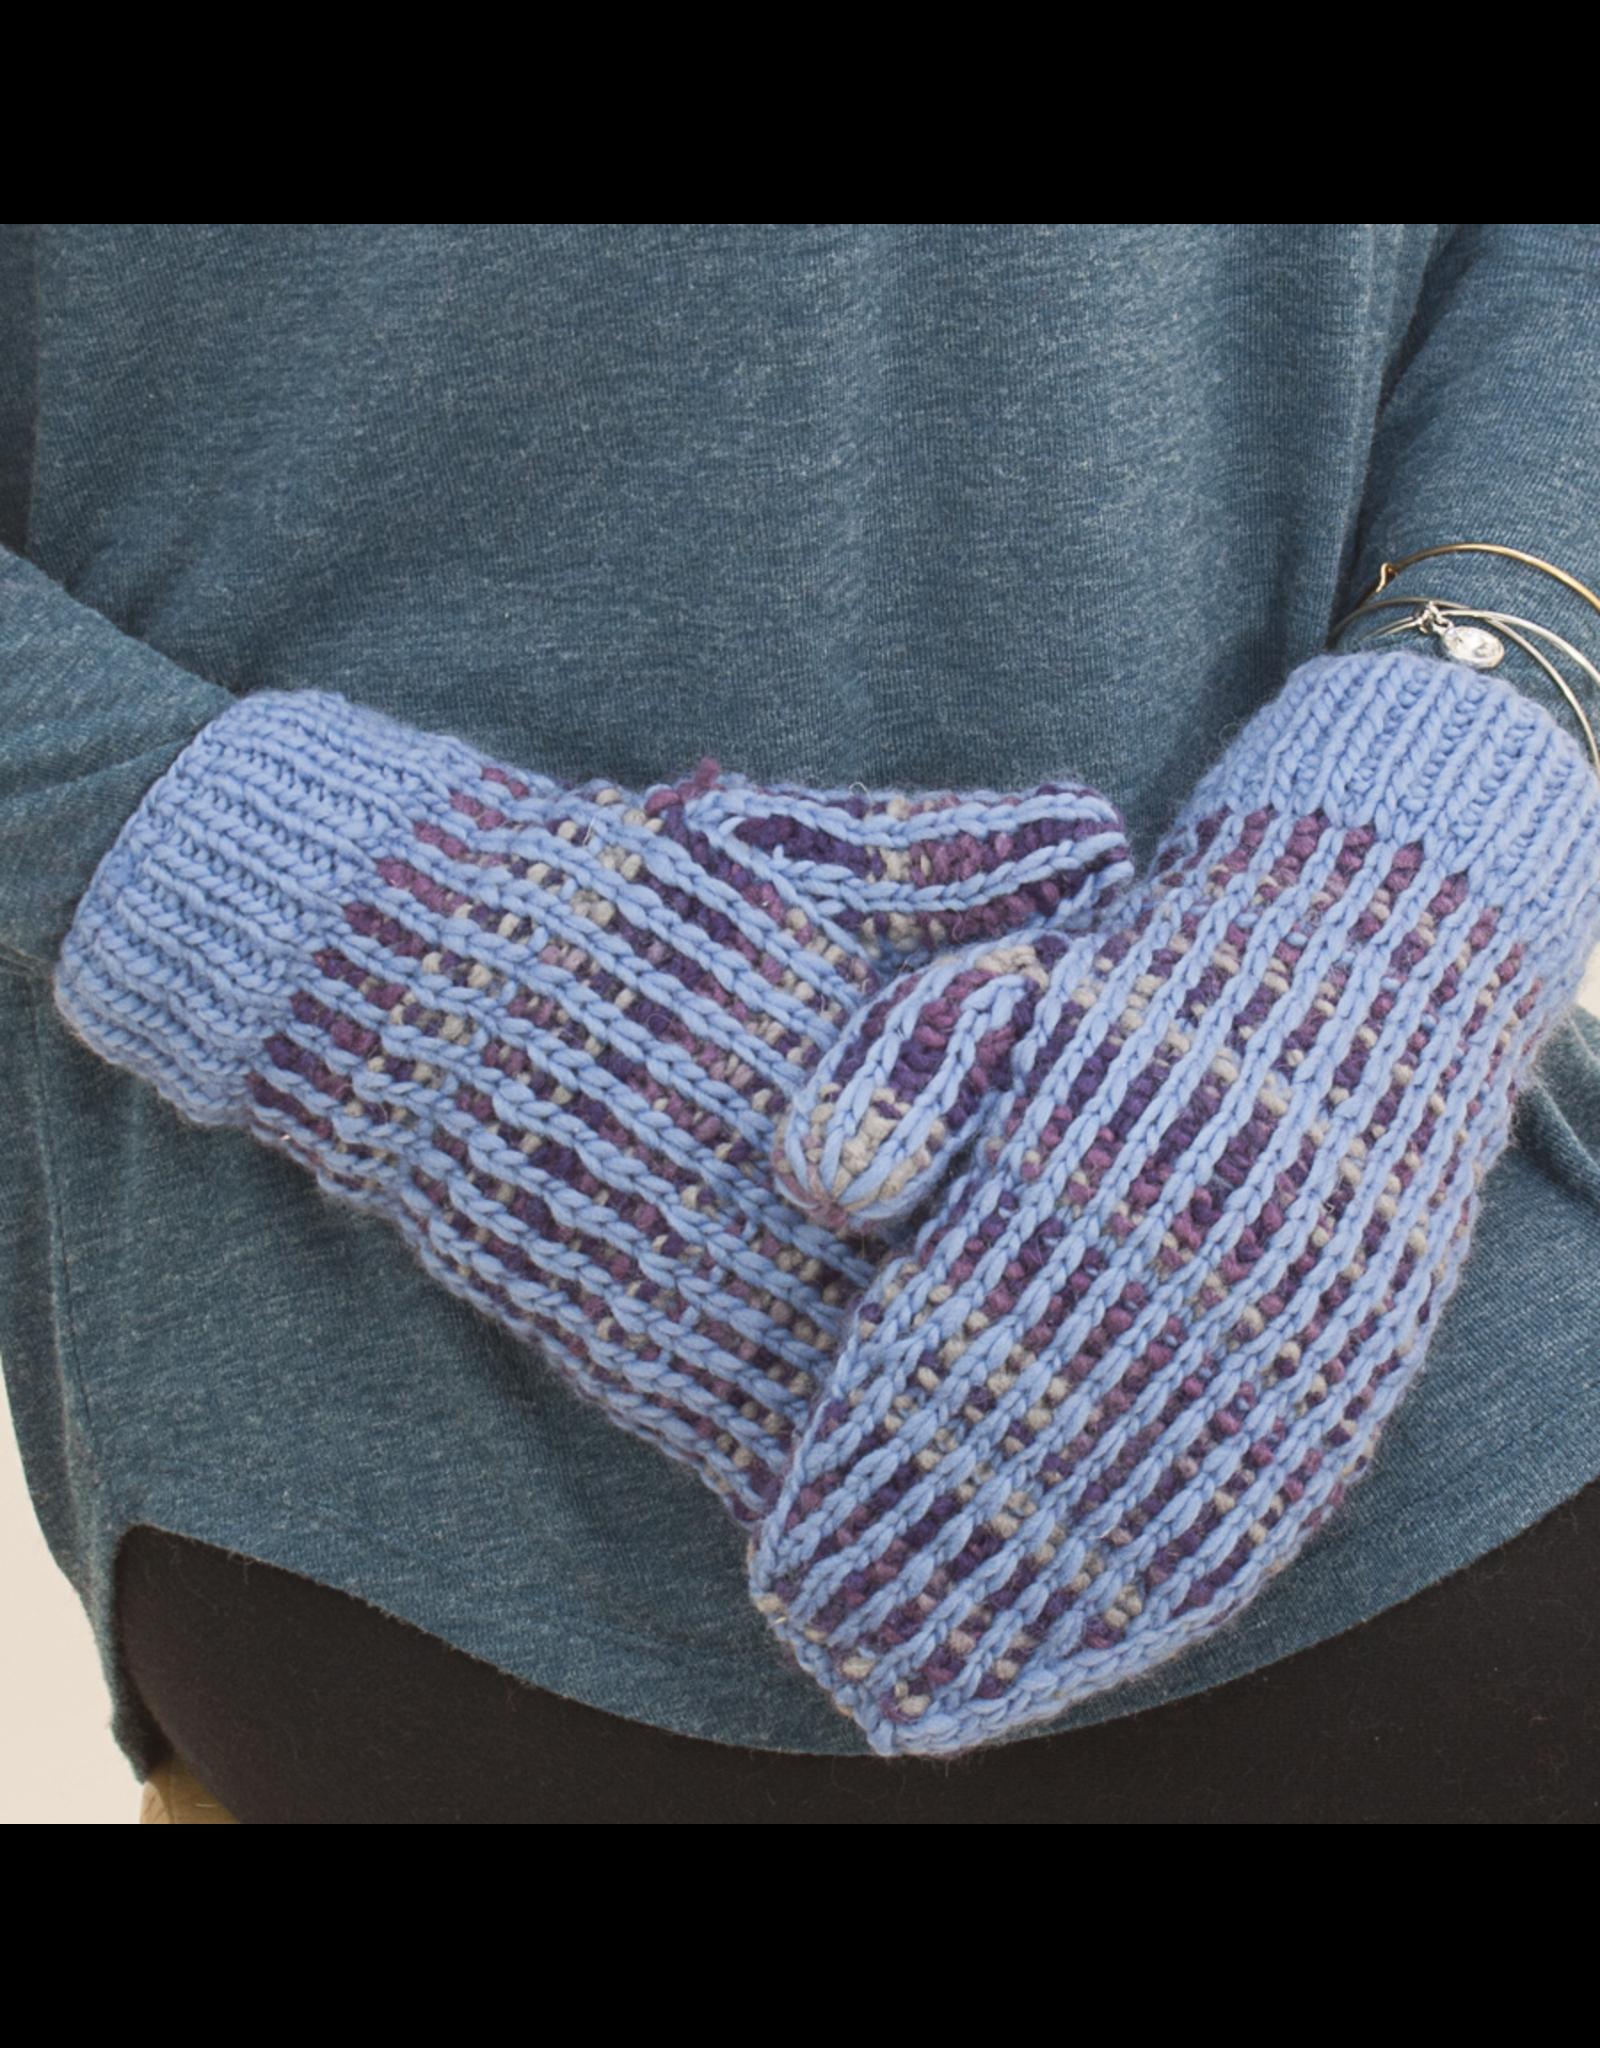 The Sweater Venture Polka Dot Fleece Lined Mittens